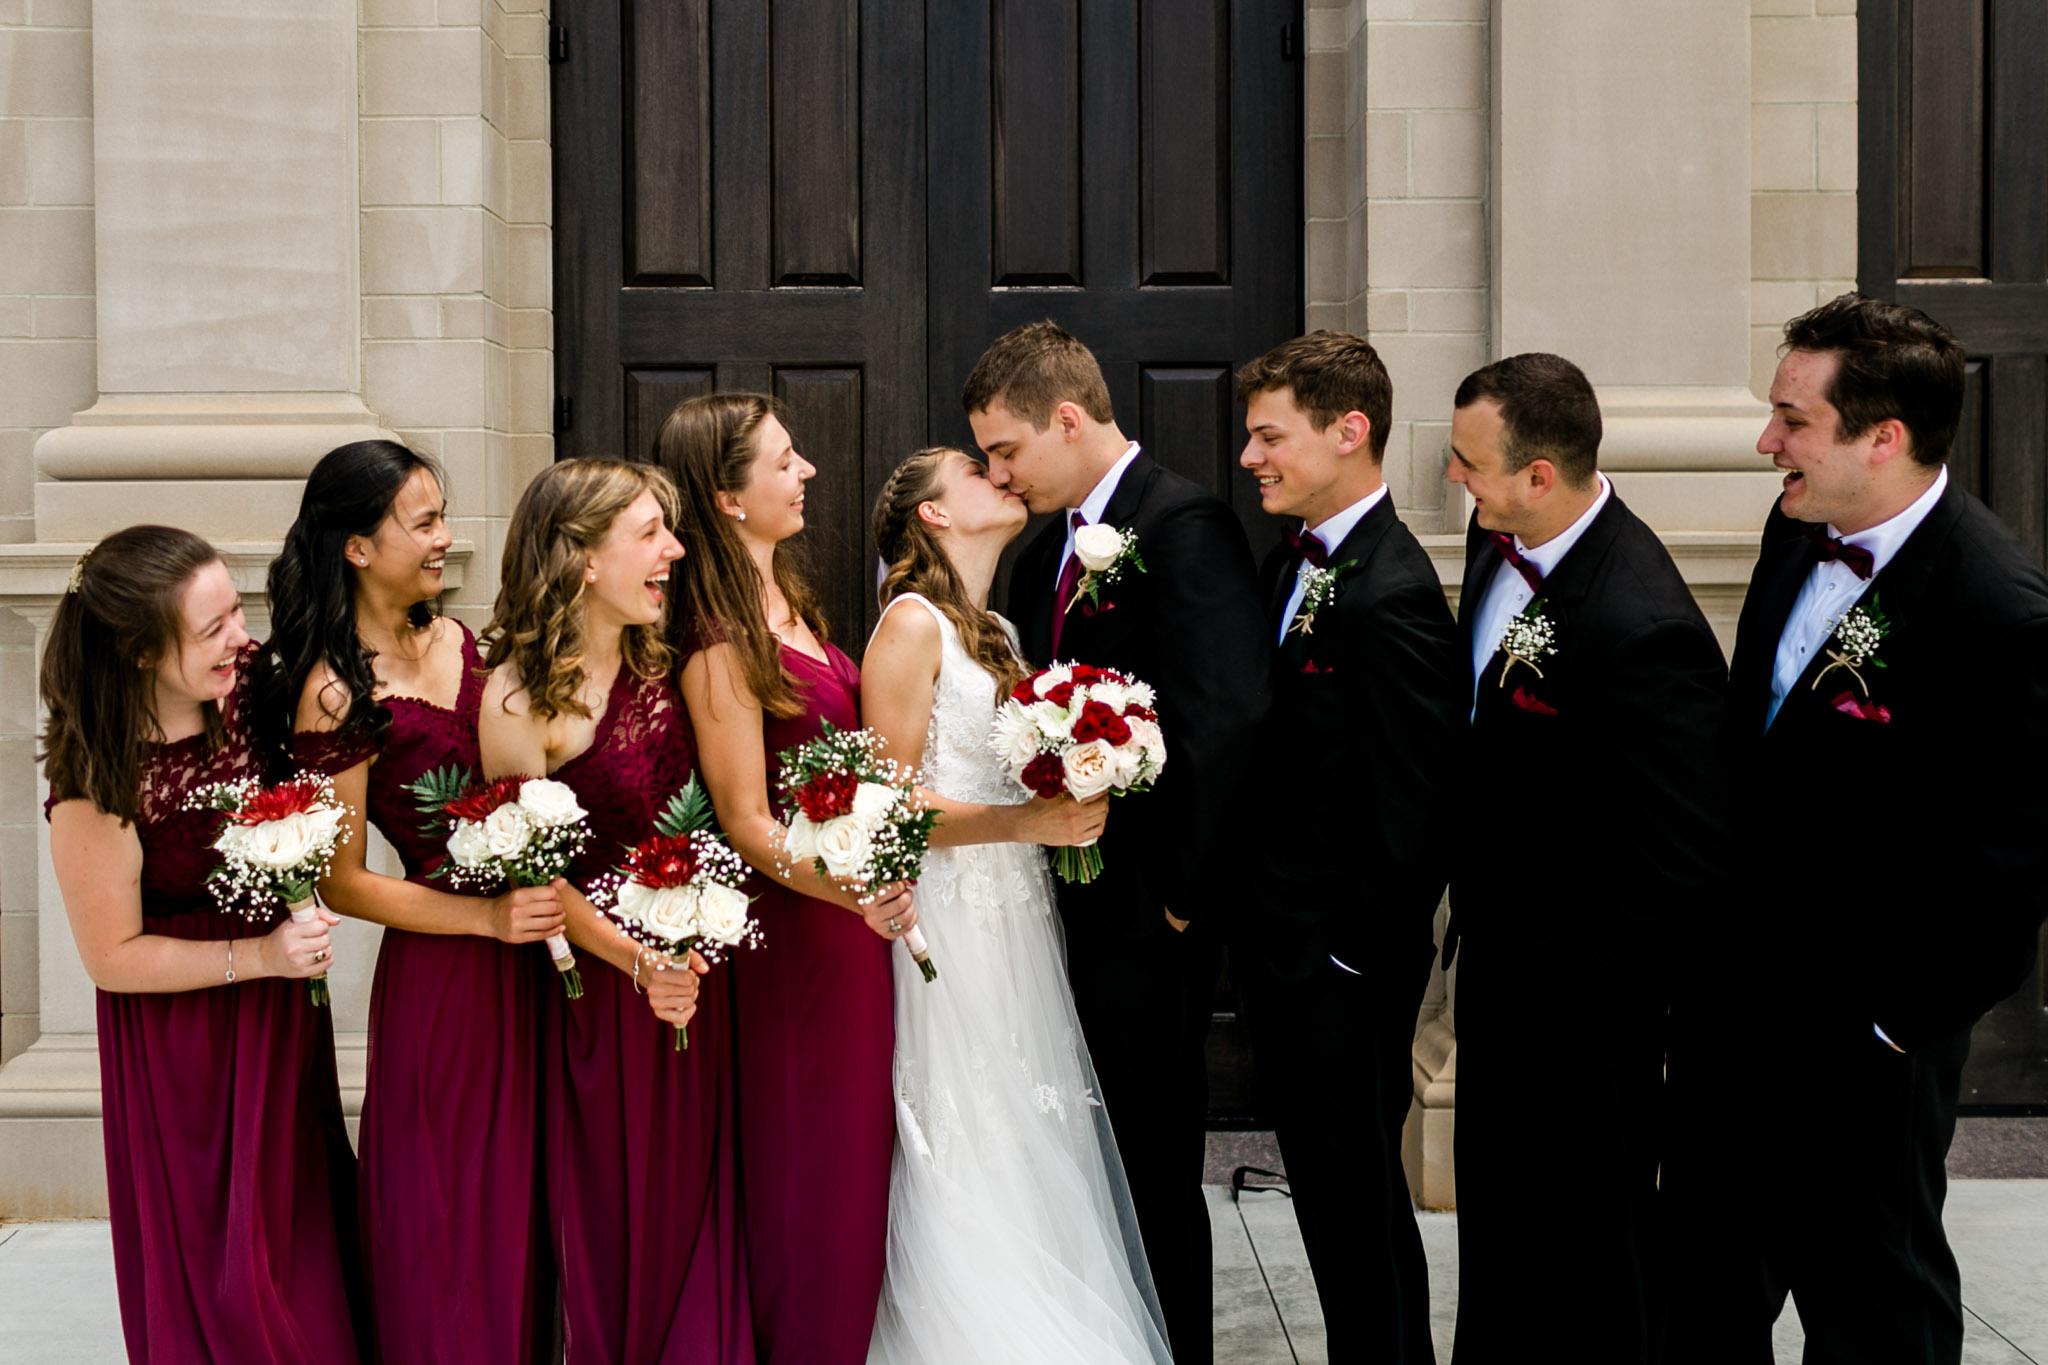 Durham-Wedding-Photographer-Portraits-38.jpg